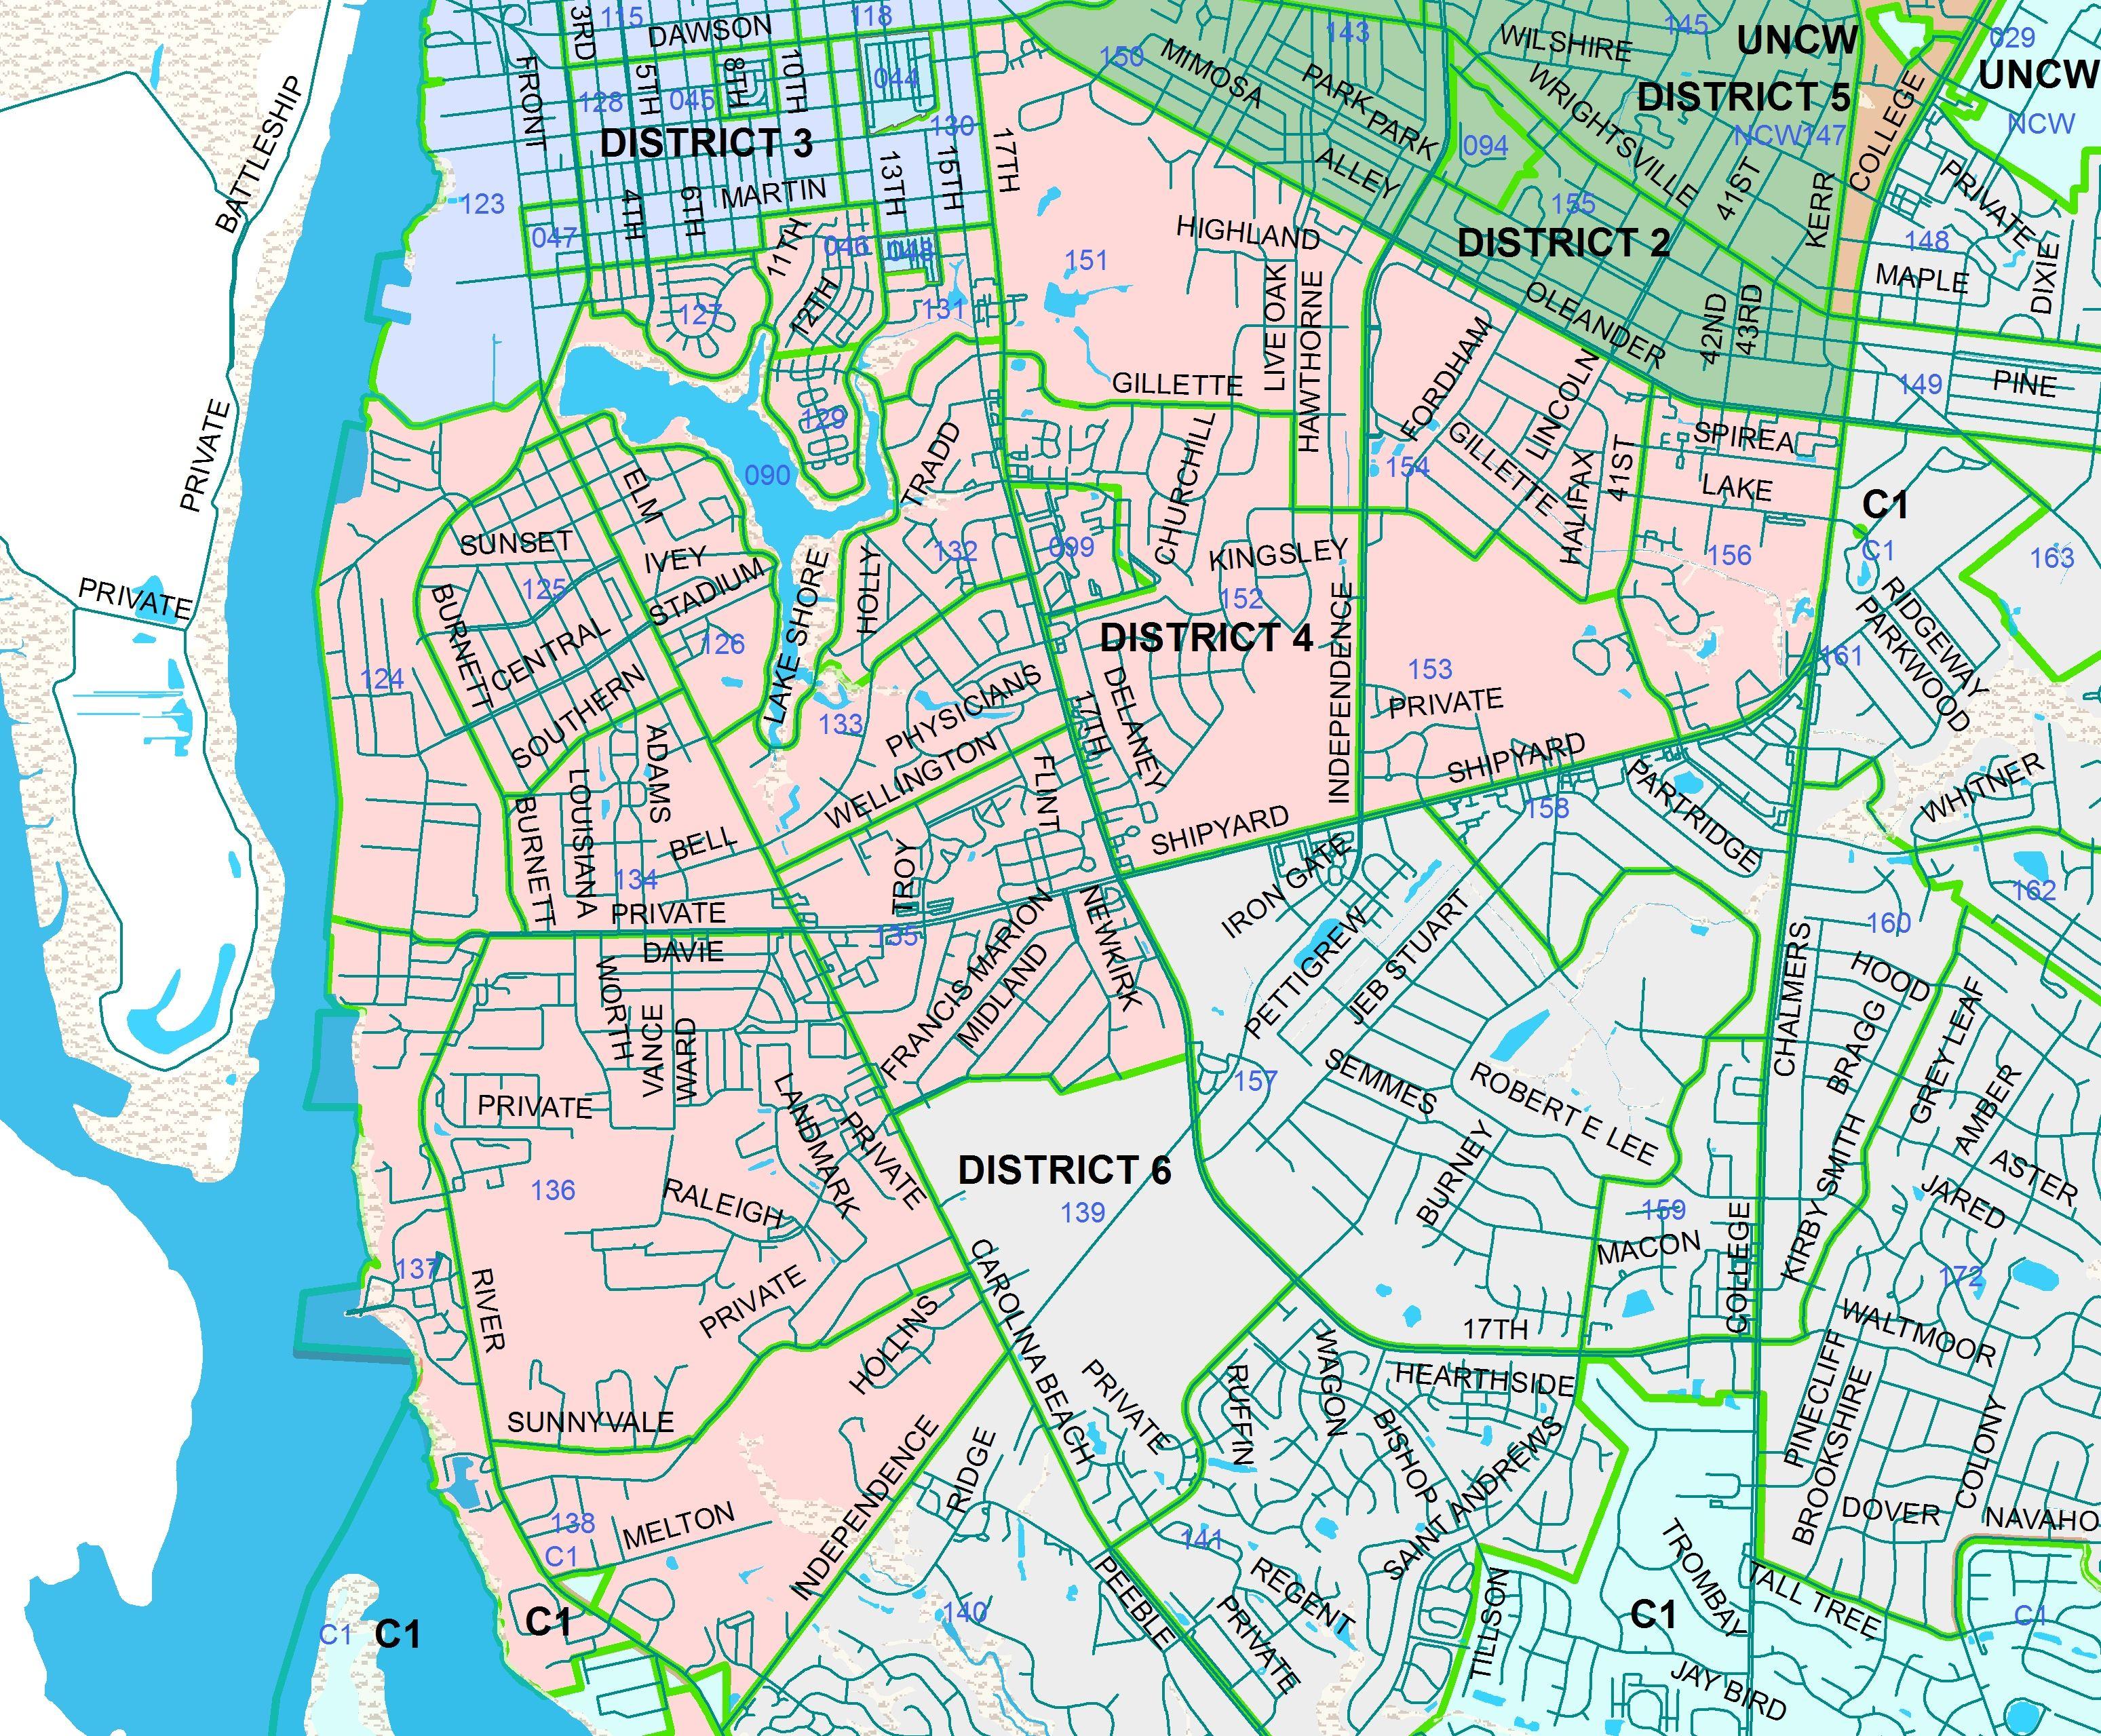 wilmington nc neighborhoods map google search